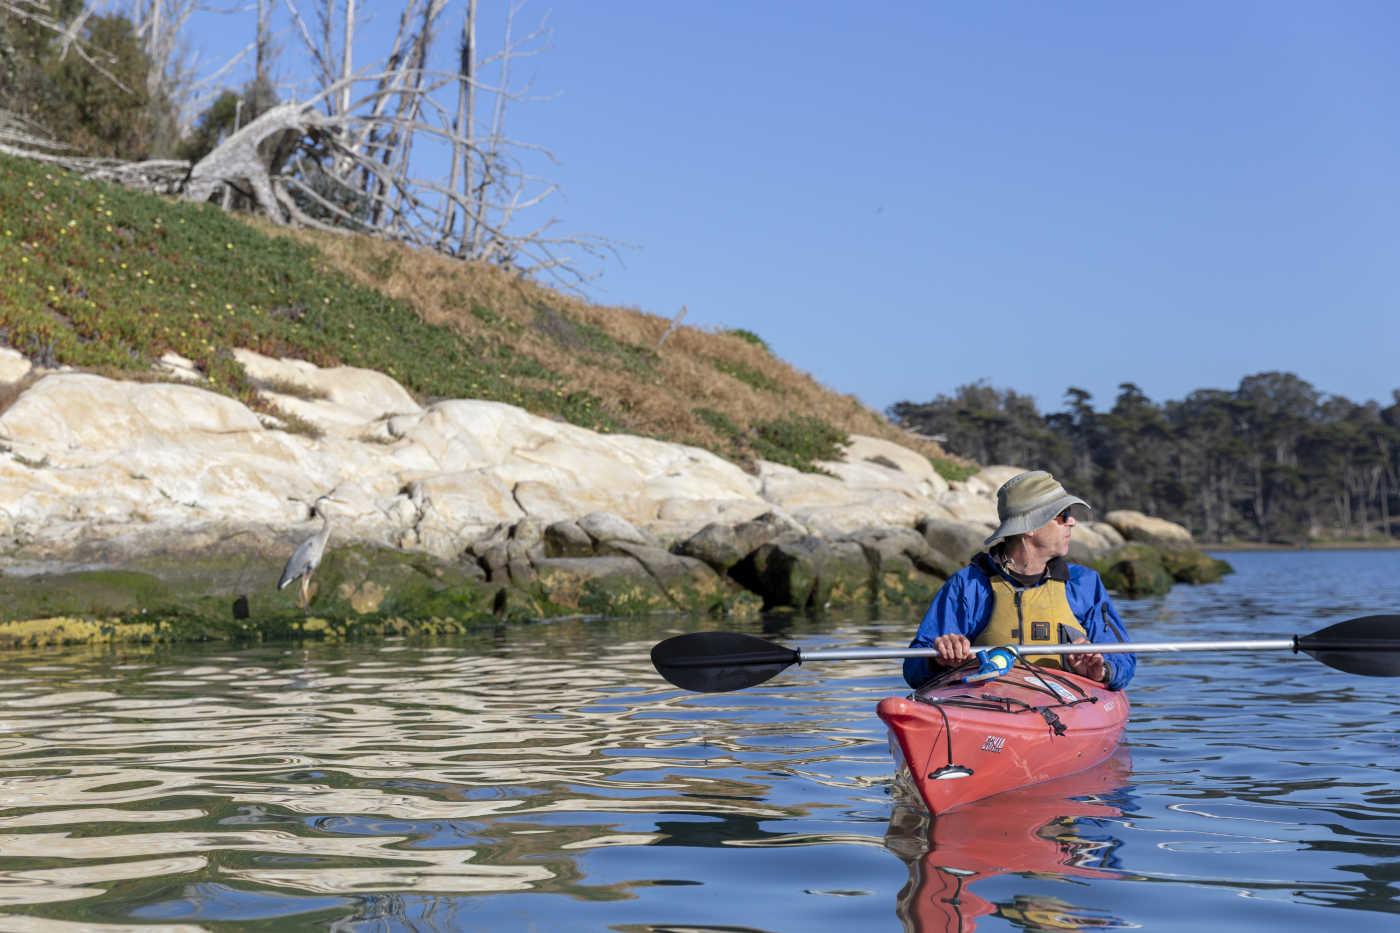 A man paddling a red kayak near a rocky shore.